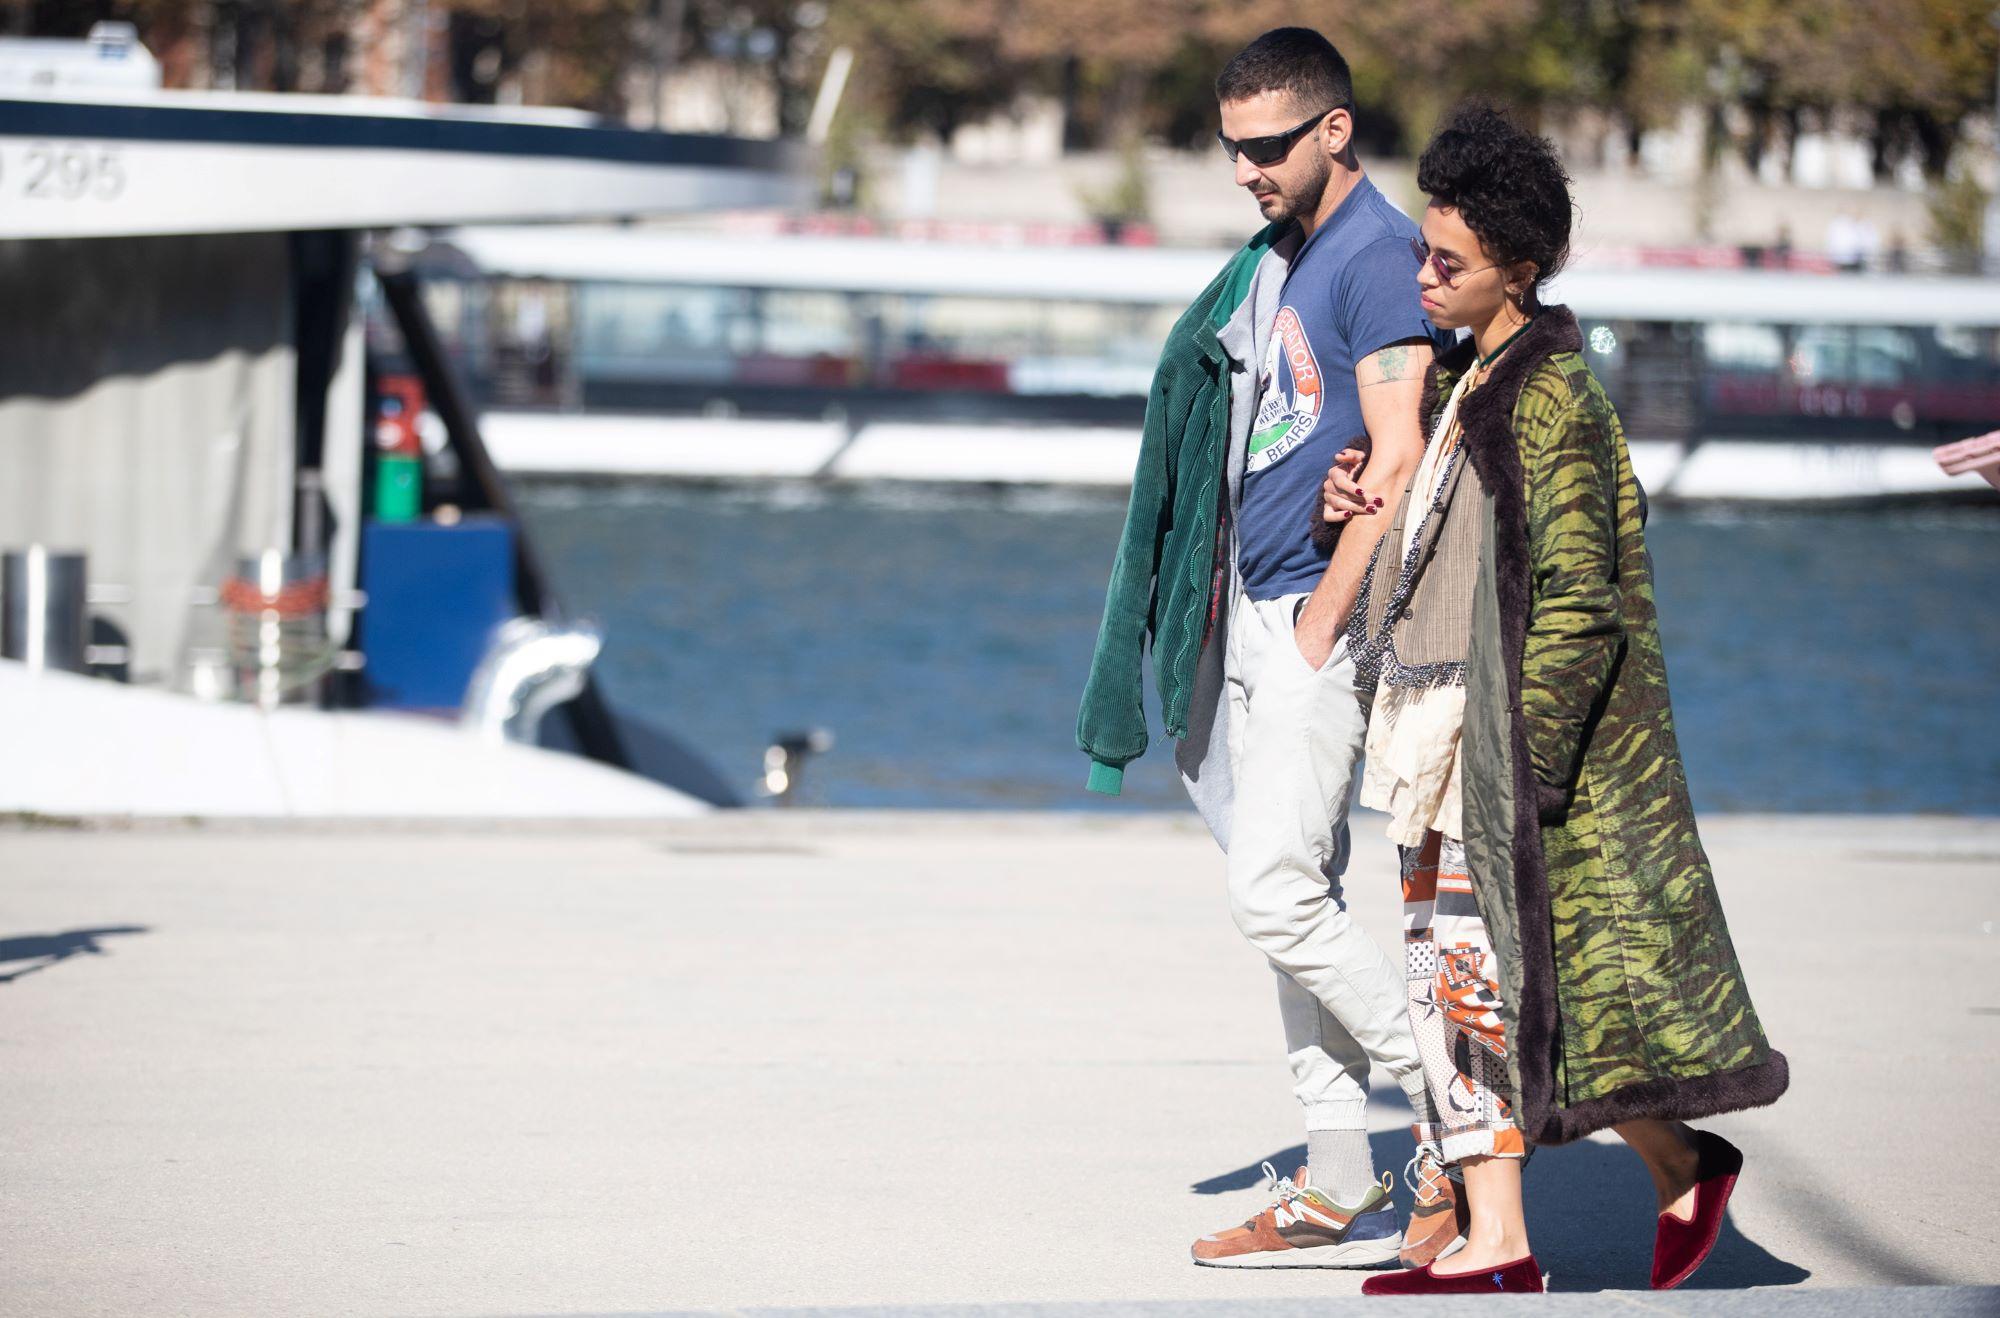 Shia LaBeouf and FKA Twigs